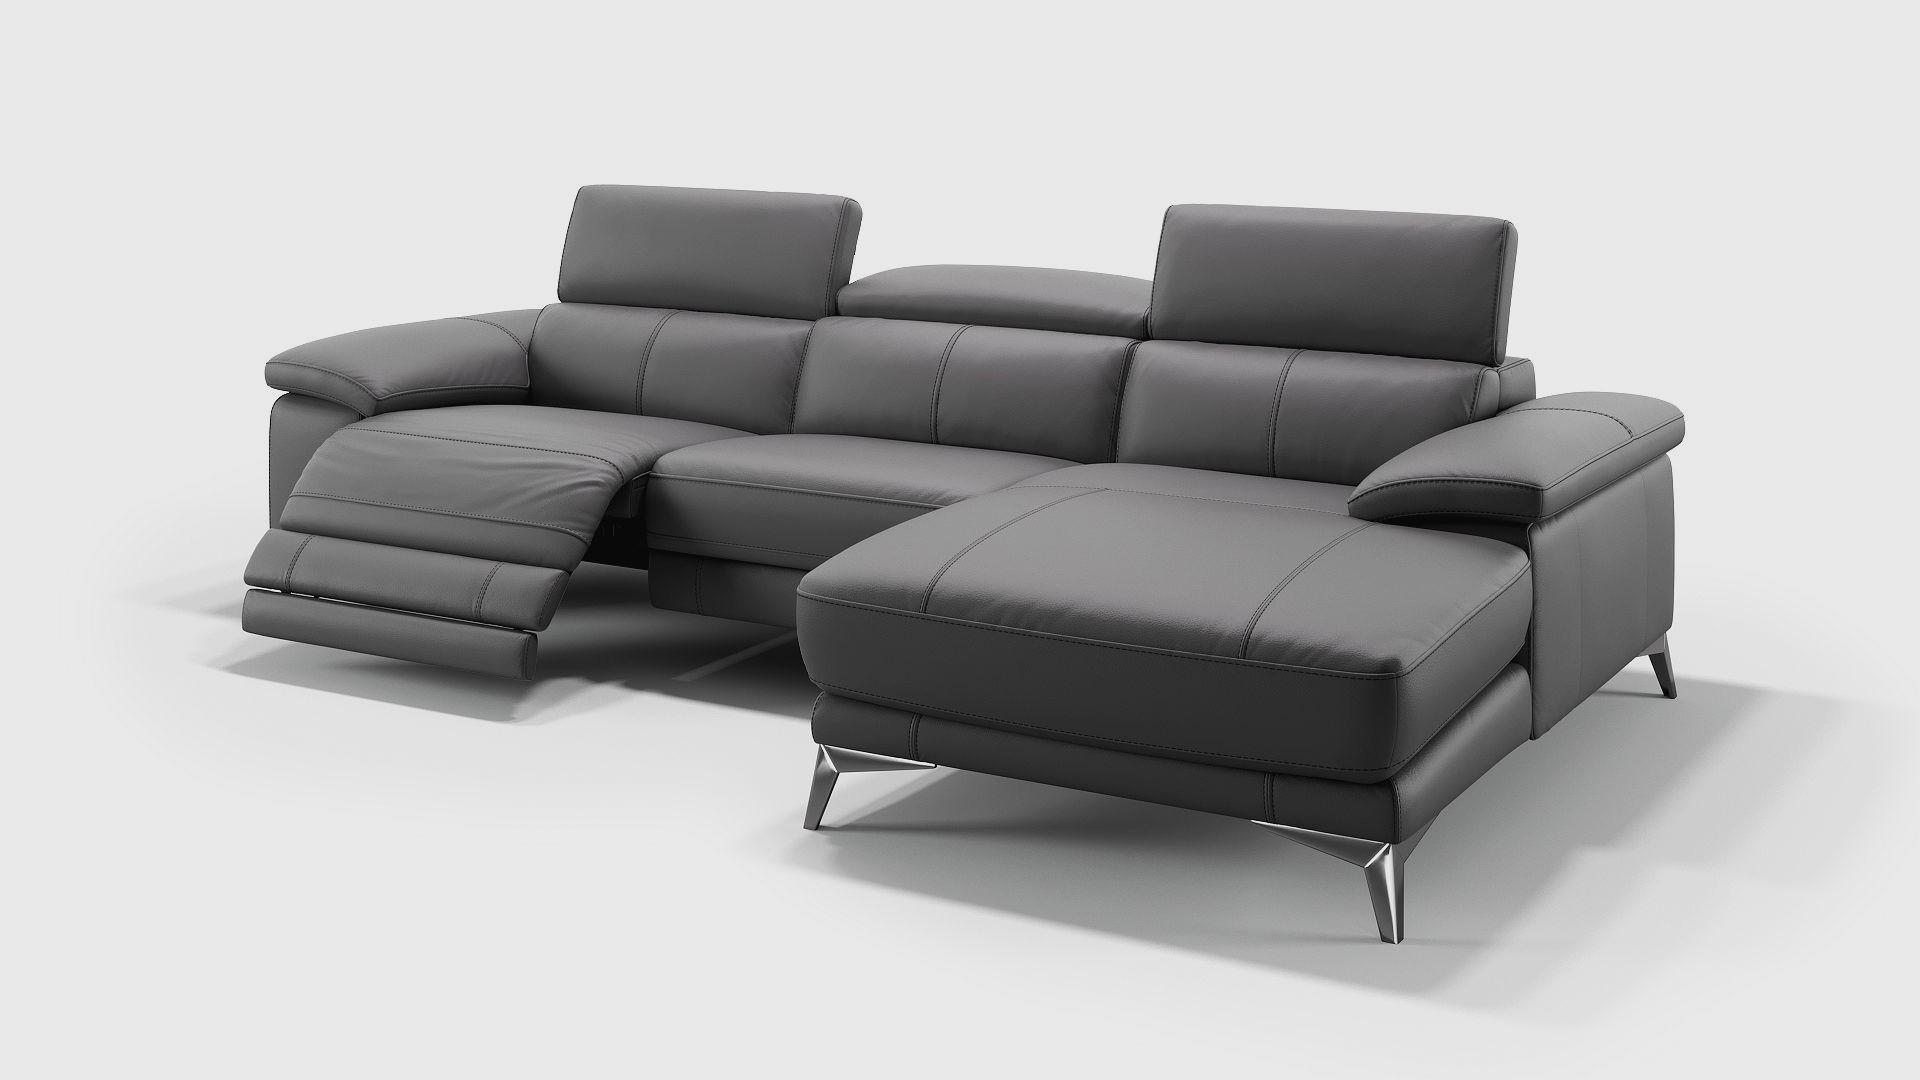 Full Size of Big Sofa Arizona Roller Sam Couch Kolonialstil Bei Rot Toronto Grau L Form Ledersofa Mit Schlaffunktion Wohnlandschaft Camilla Rechts Stoff Modernes Wohnzimmer Big Sofa Roller